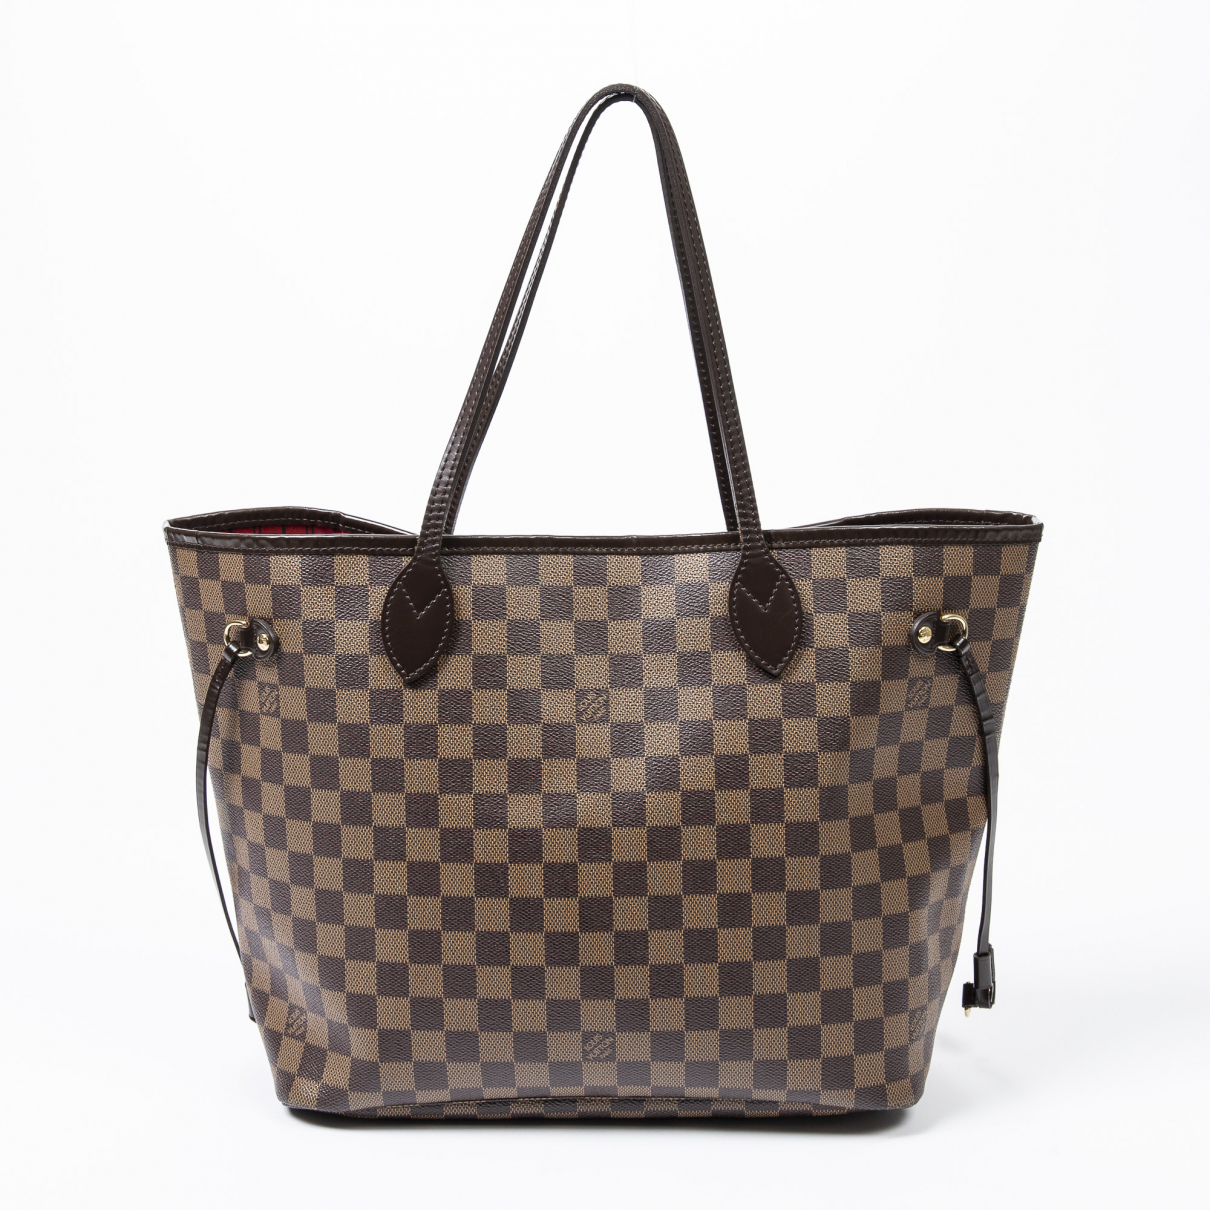 Louis Vuitton - Sac a main Neverfull pour femme en cuir - marron